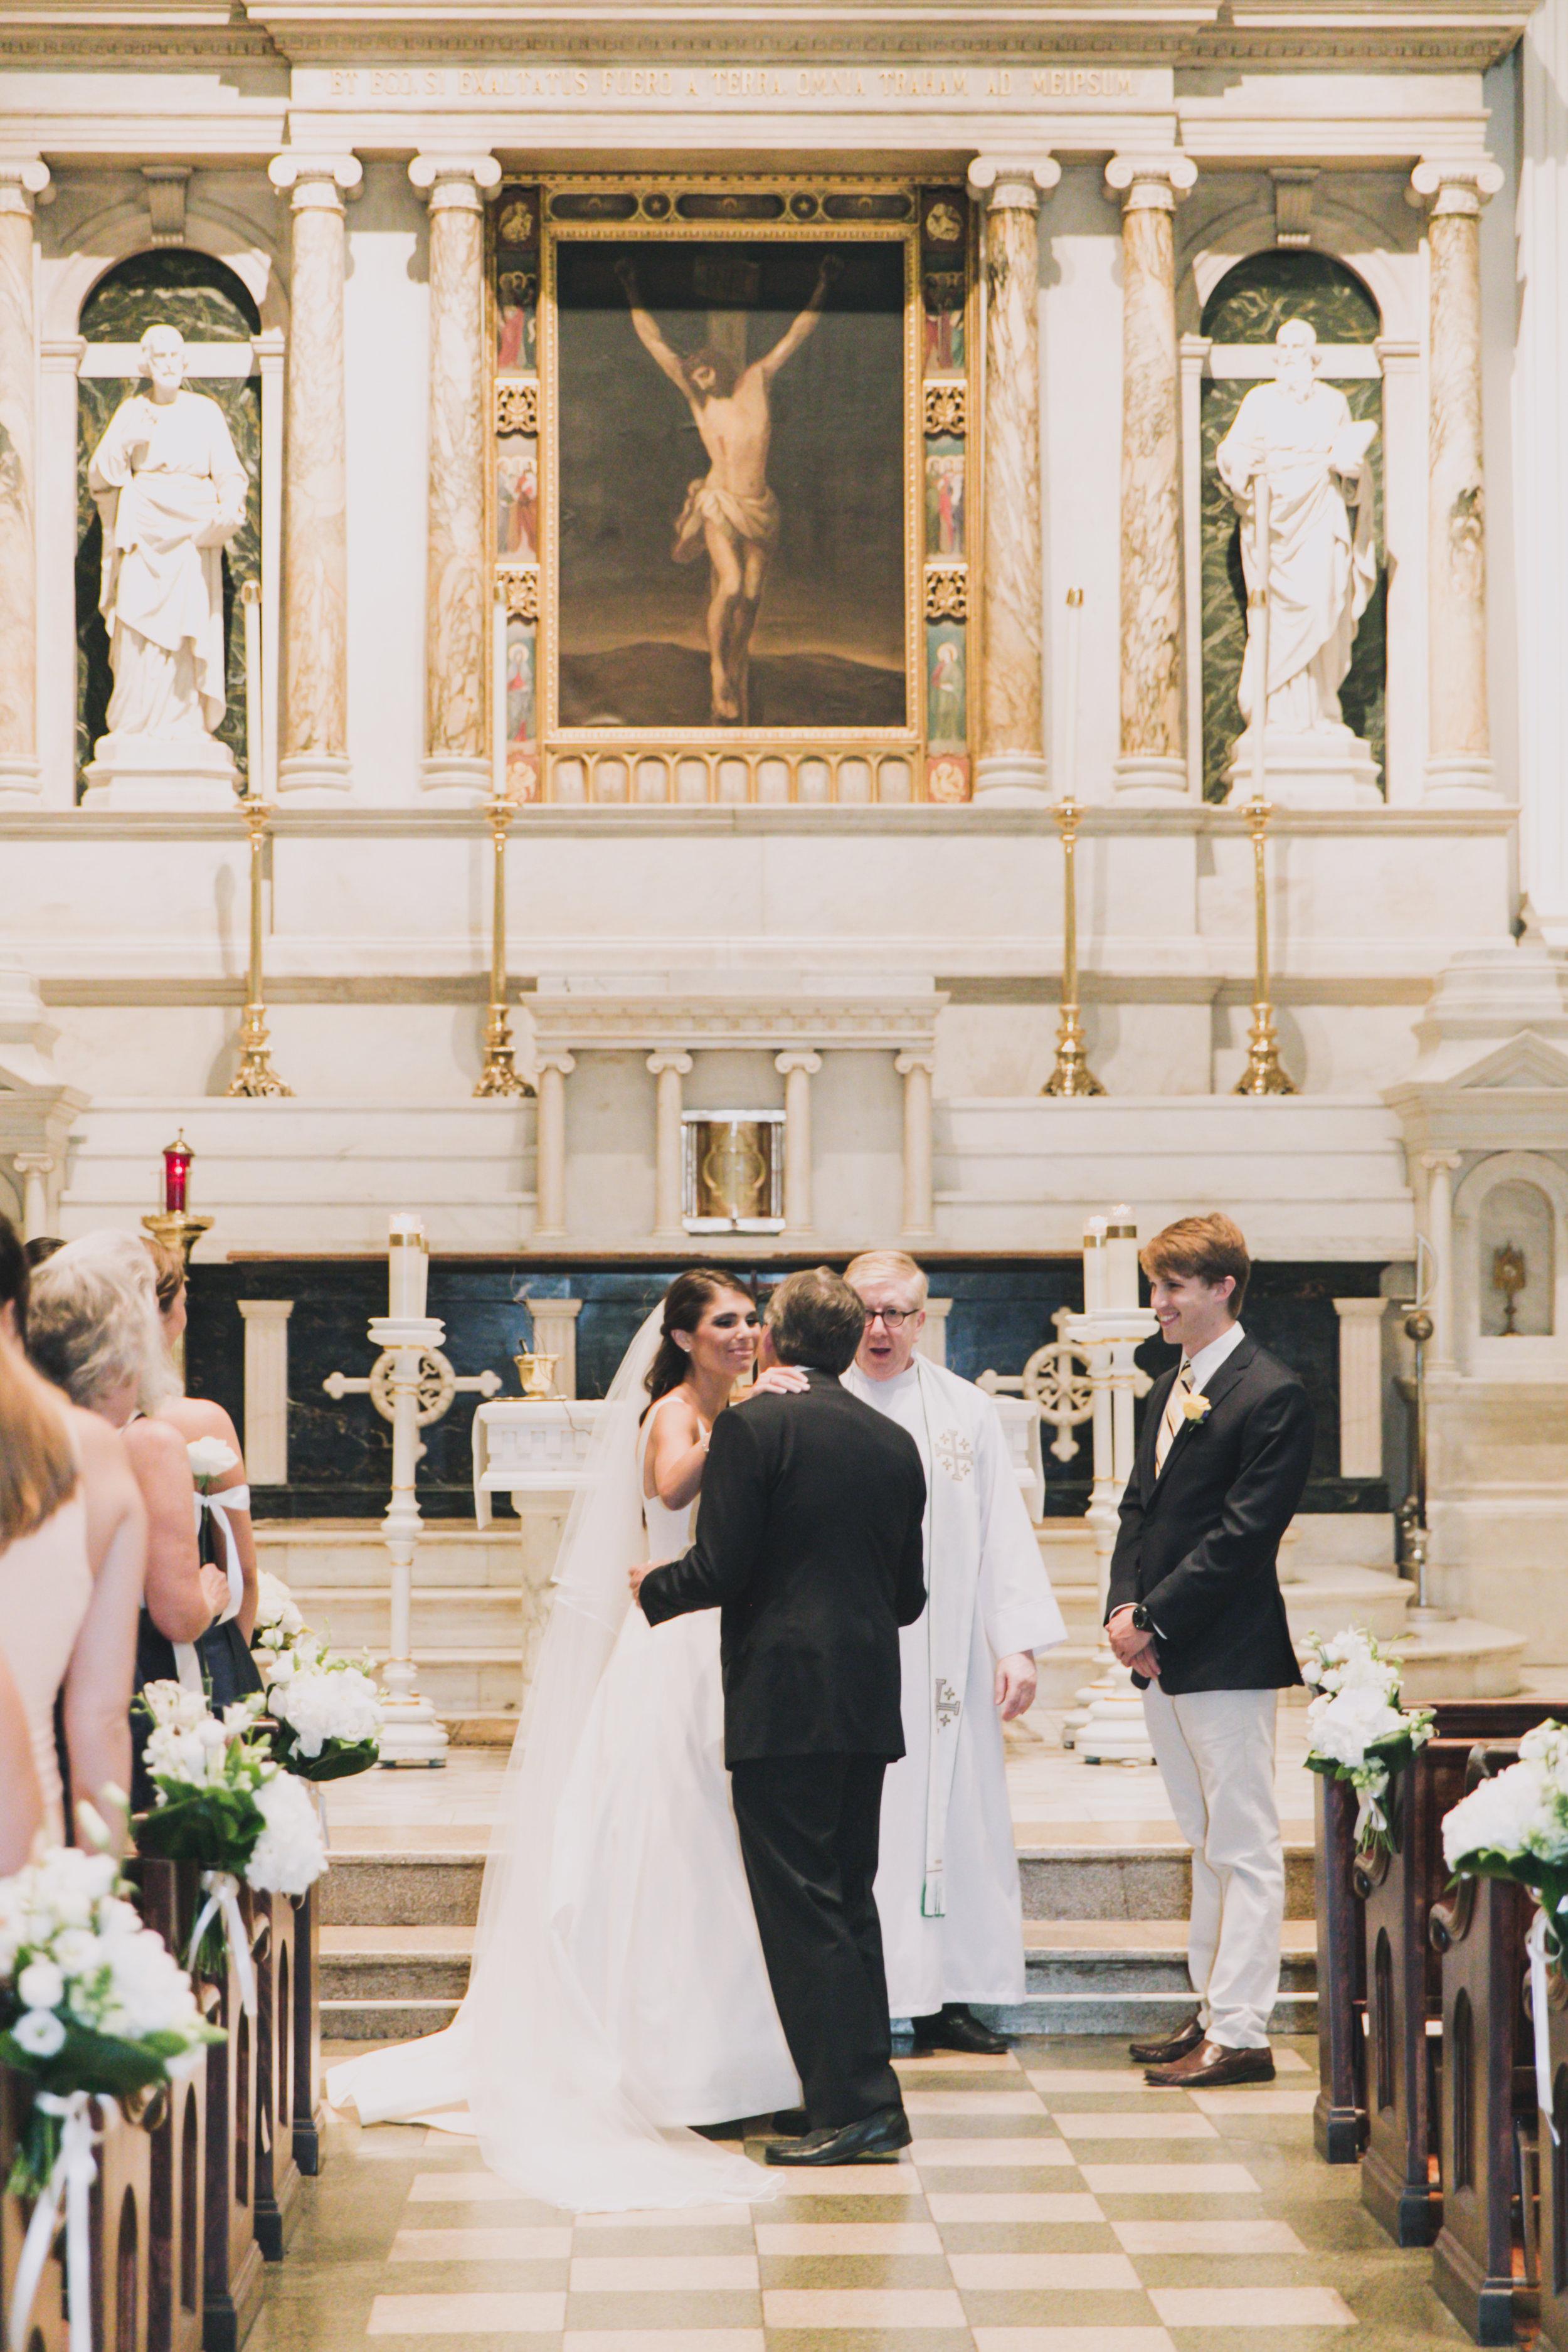 Madeleine_Matt_Wedding_Slideshow_Jpegs-058.jpg